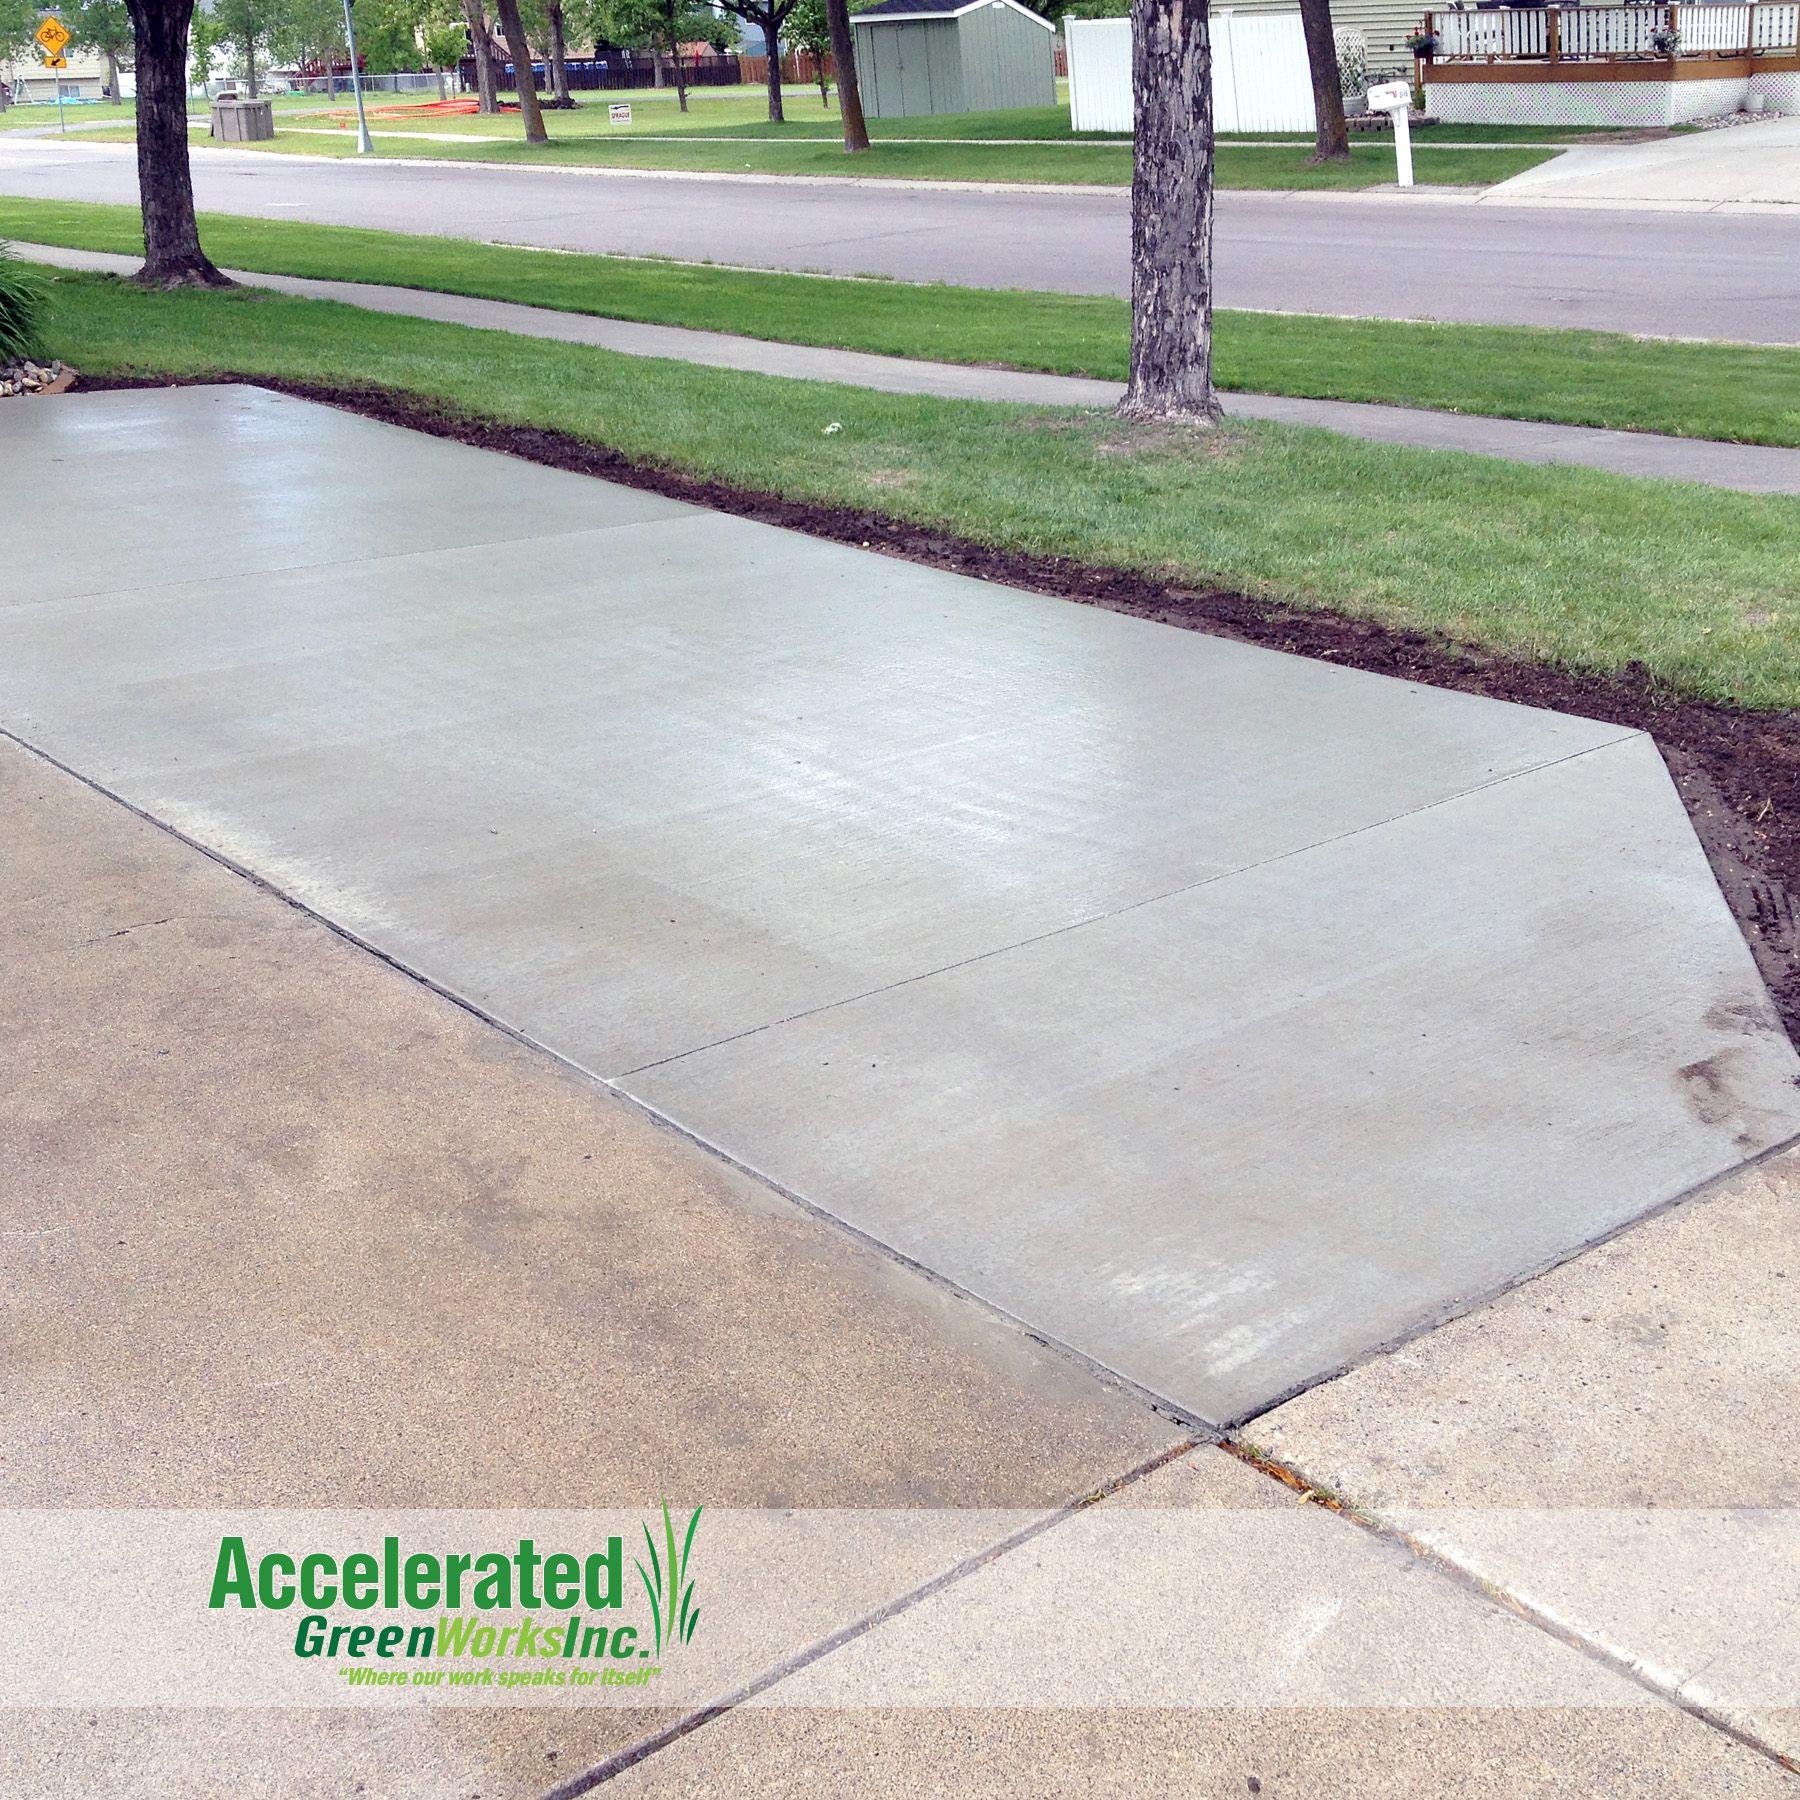 Concrete Driveway Design Ideas using borders on concrete driveway designs A Standard Grey Concrete Driveway Extension